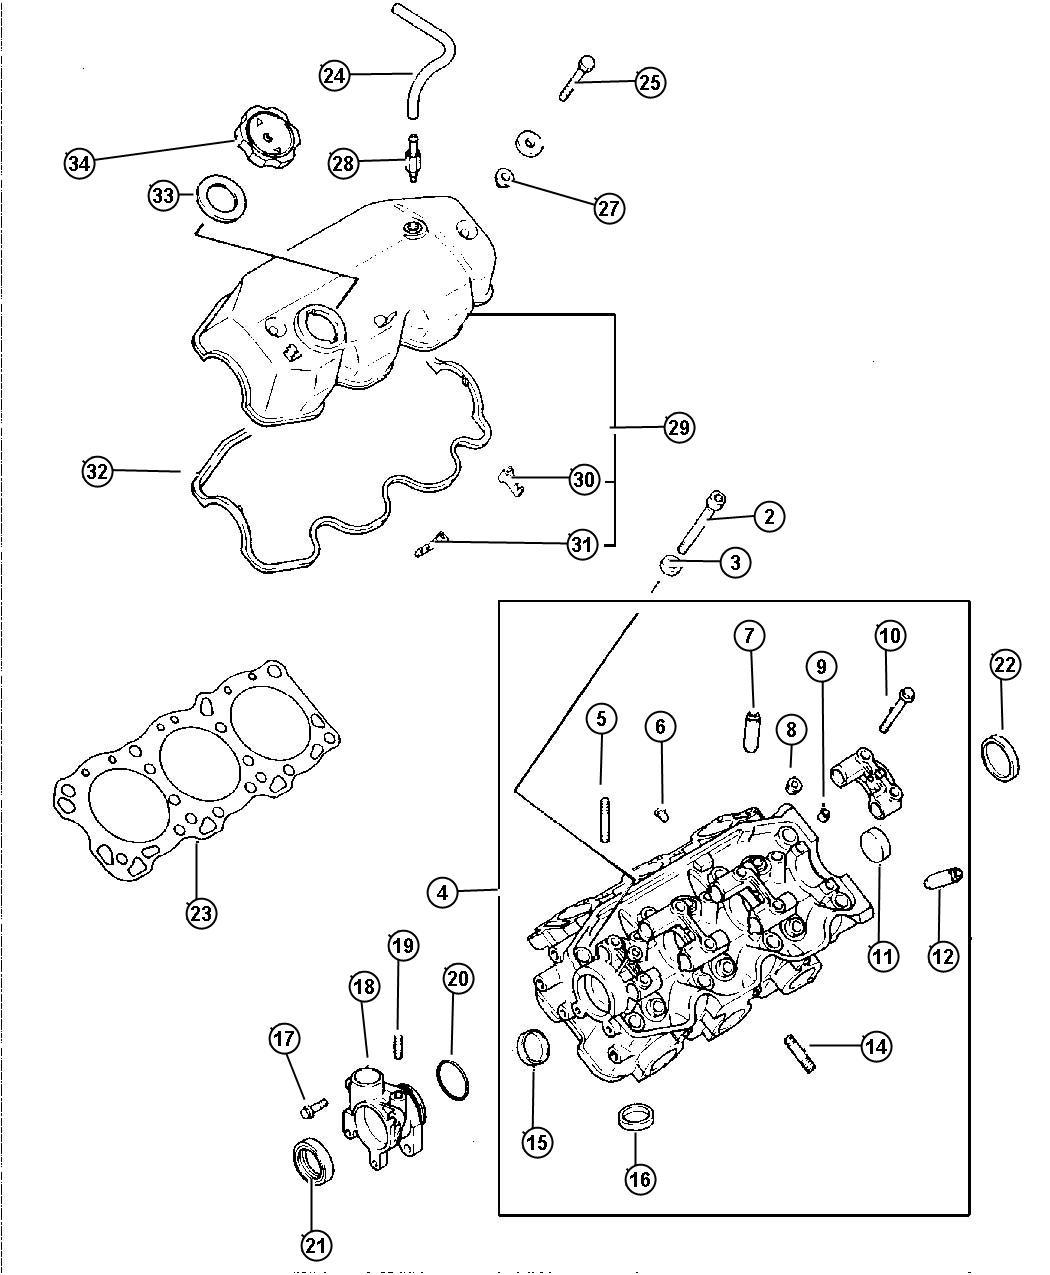 subaru forester parts diagram fiat stilo wiring outback brakes html imageresizertool com